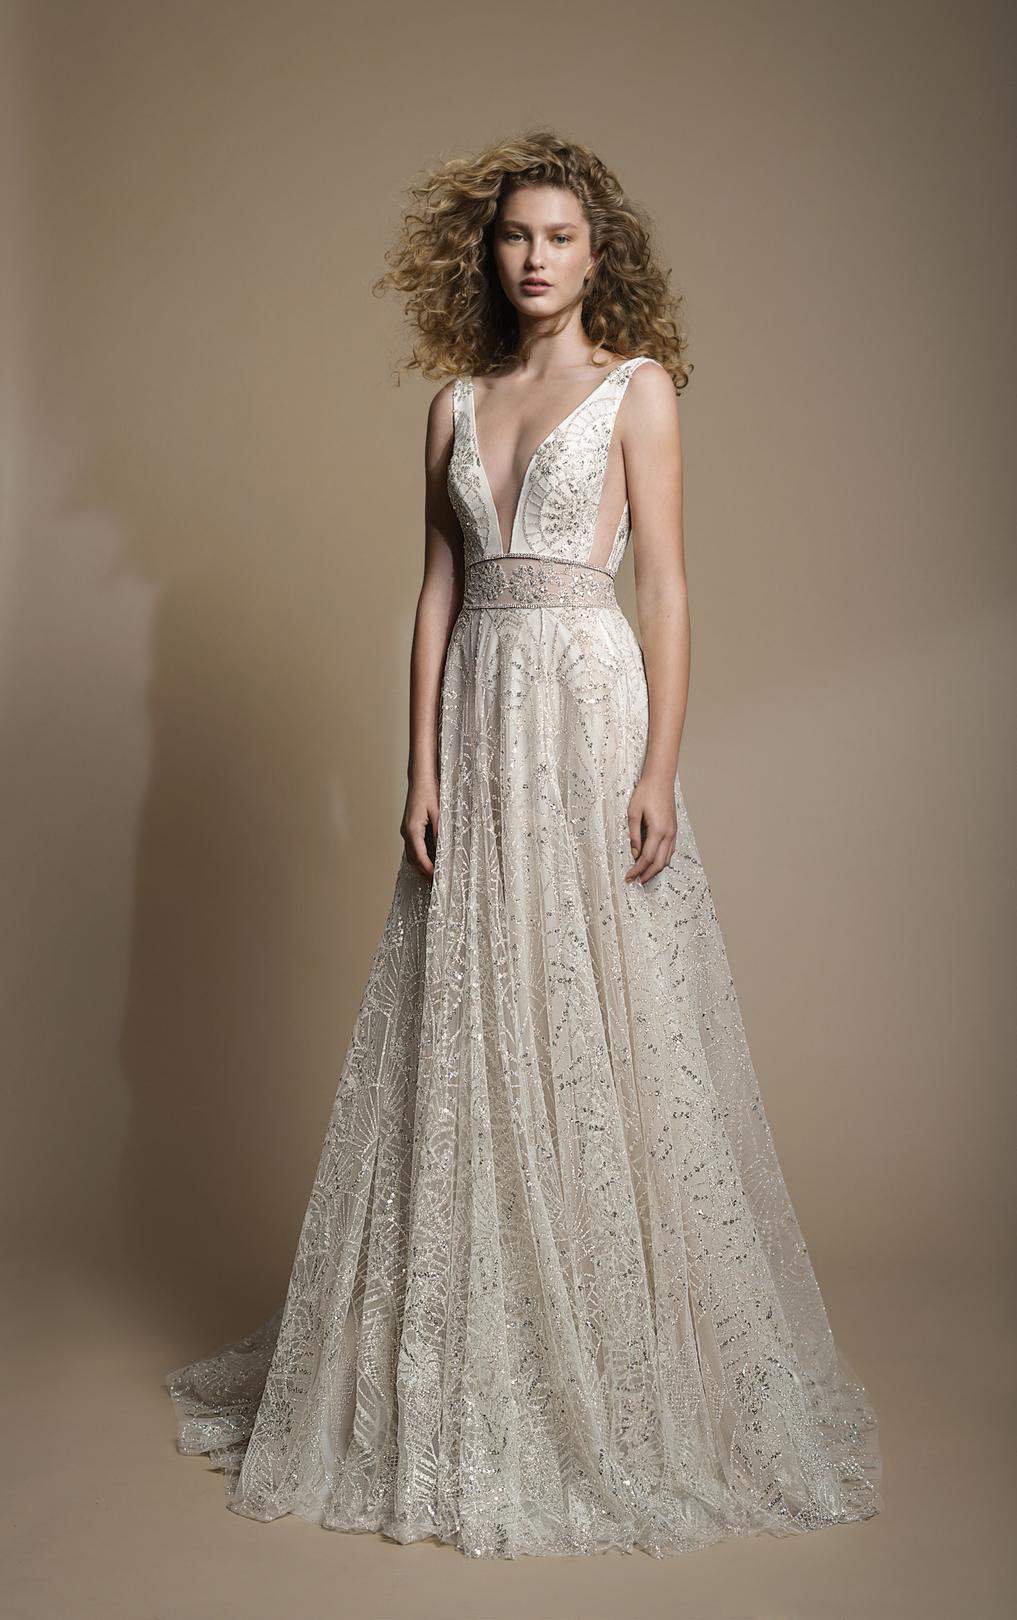 Dress main 2x 1547312500